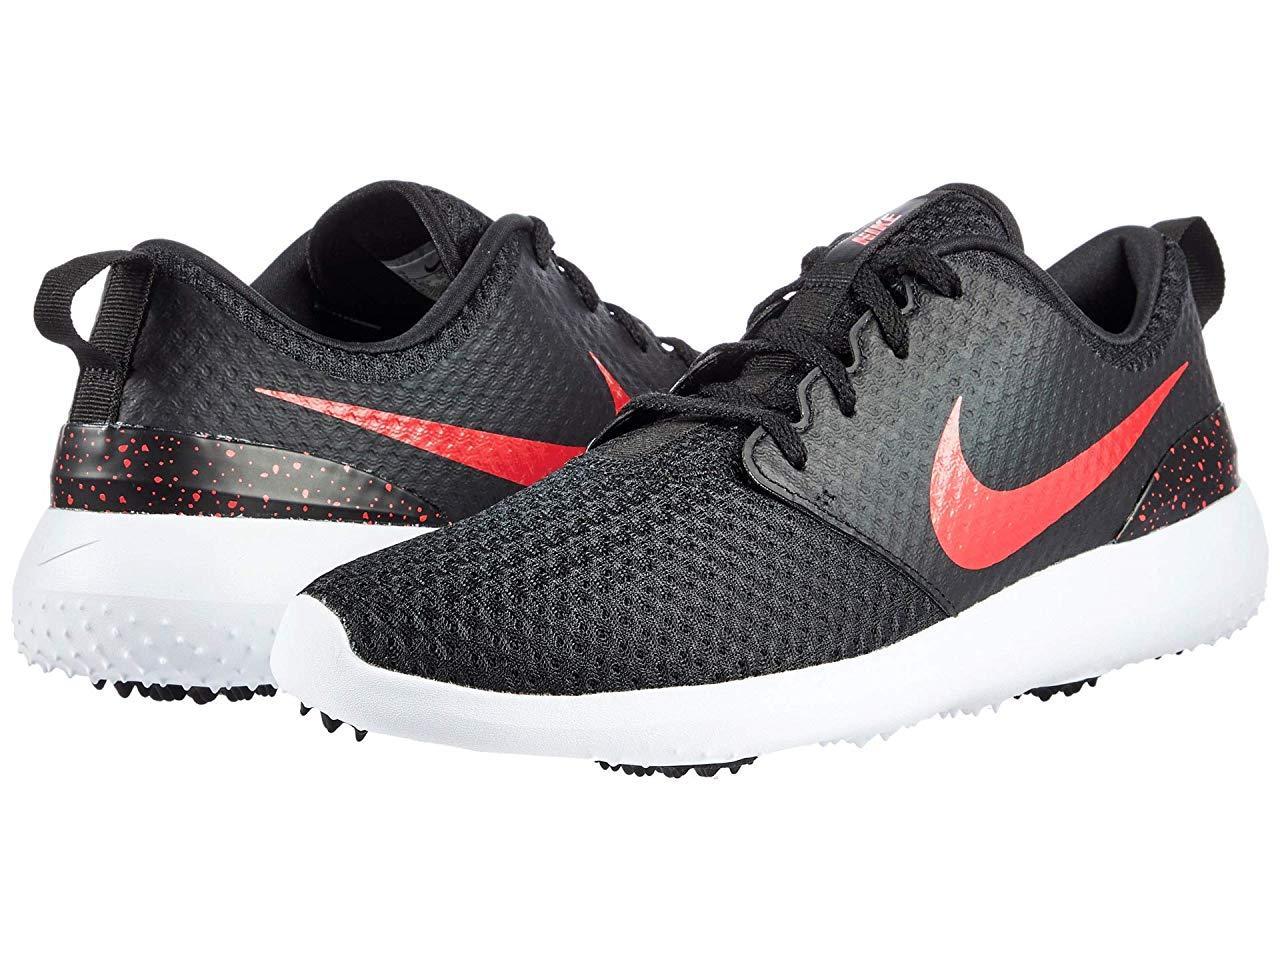 Кроссовки/Кеды Nike Golf Roshe G Black/University Red/White